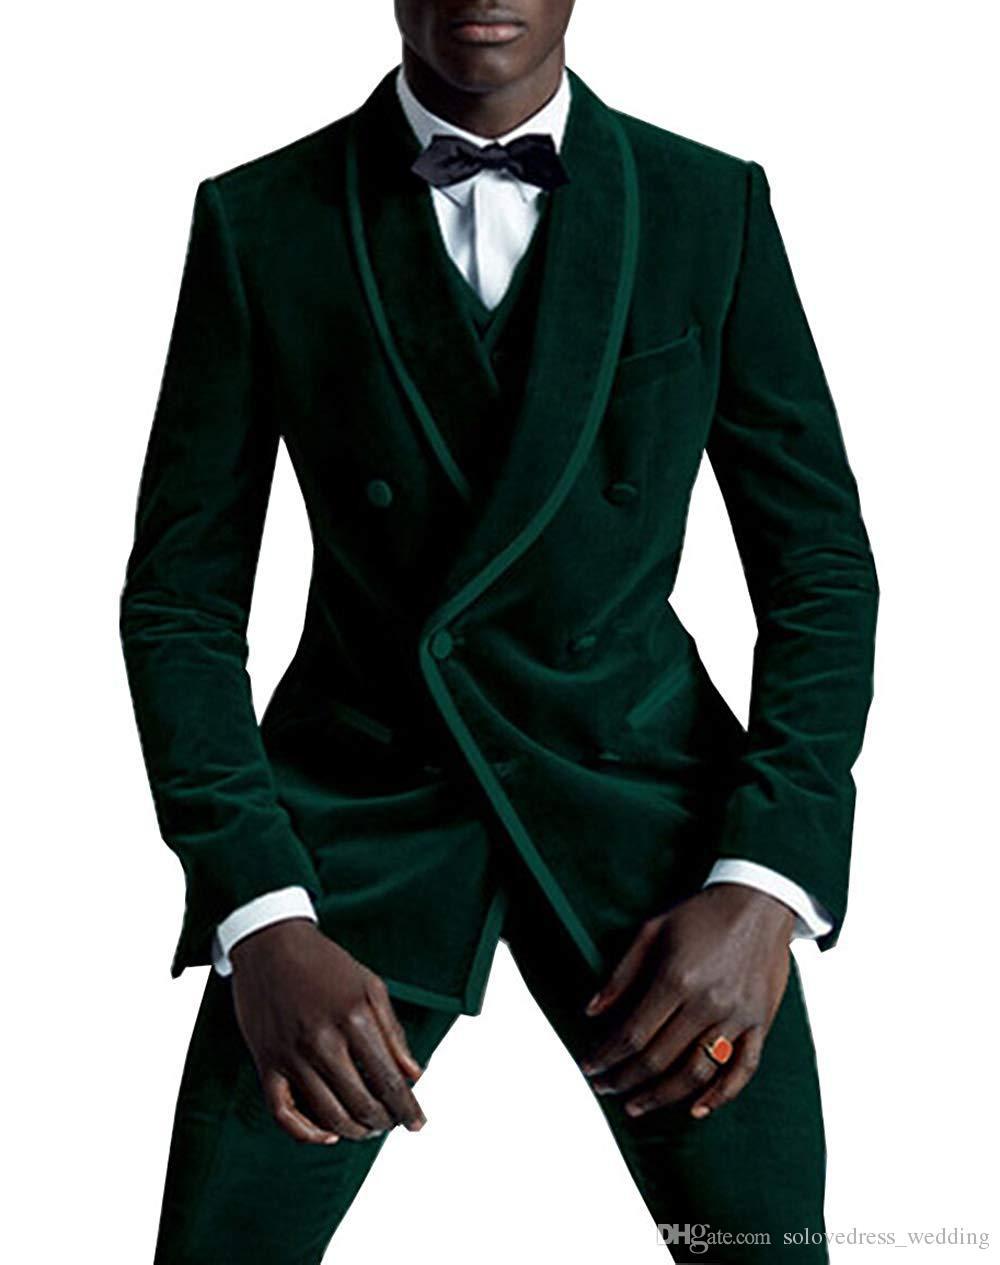 New Green Men's Suits Two Pieces Customize Slim Fit Groom Tuxedos Groomsmen Wedding Men Suits (Jacket+Pants)